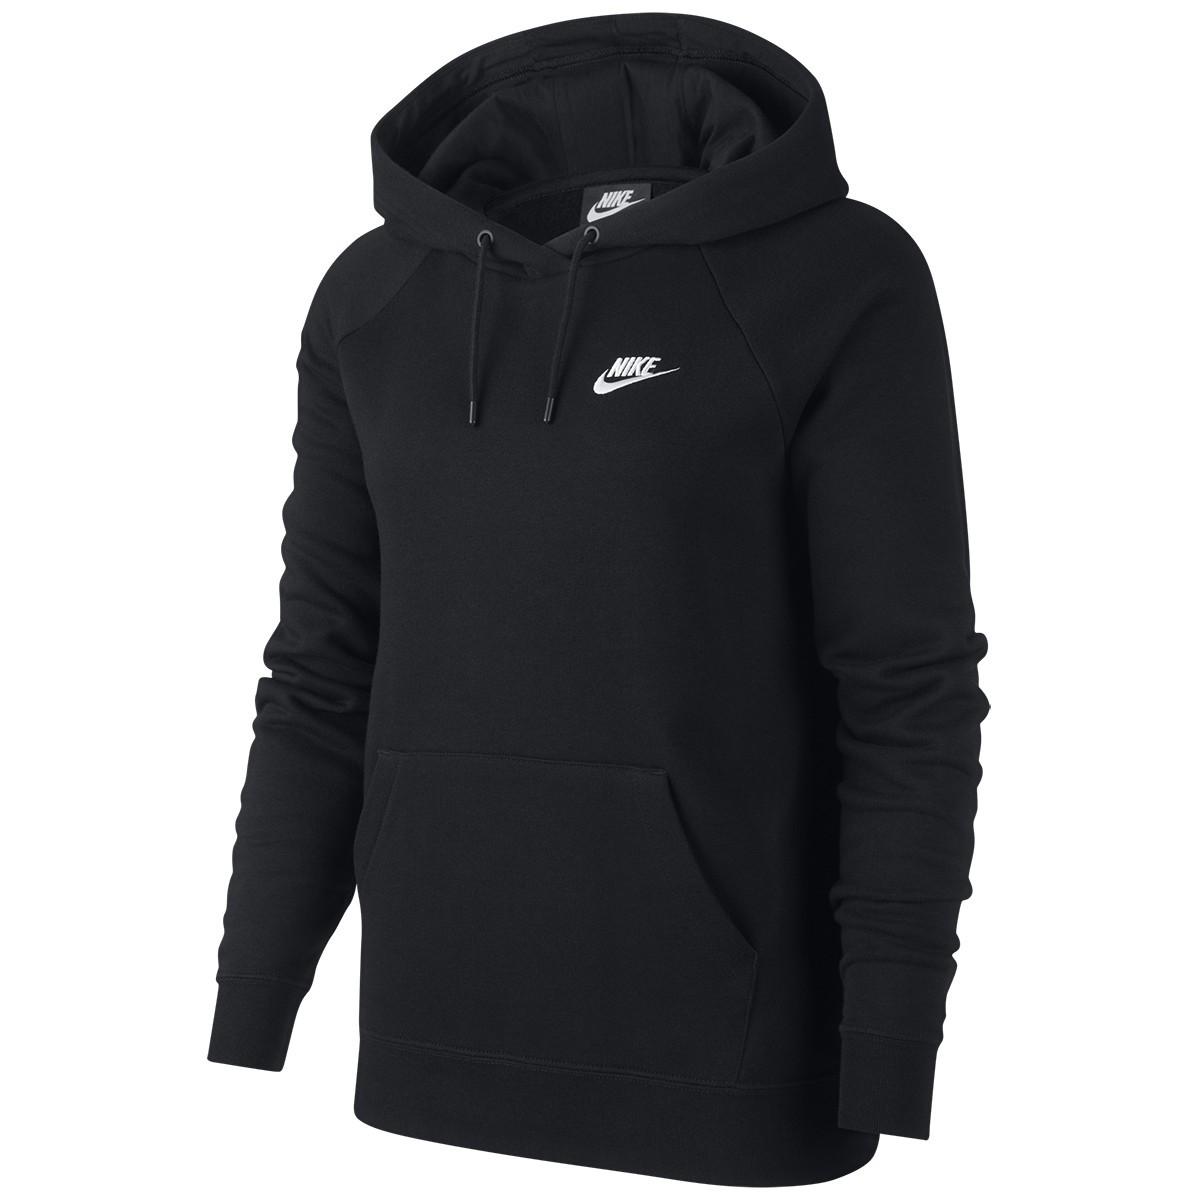 trasferimento Ammettere roccia  acheter sweat Nike femme,Nike sweat capuche femme - Achat Vente pas cher -  www.tassha.fr